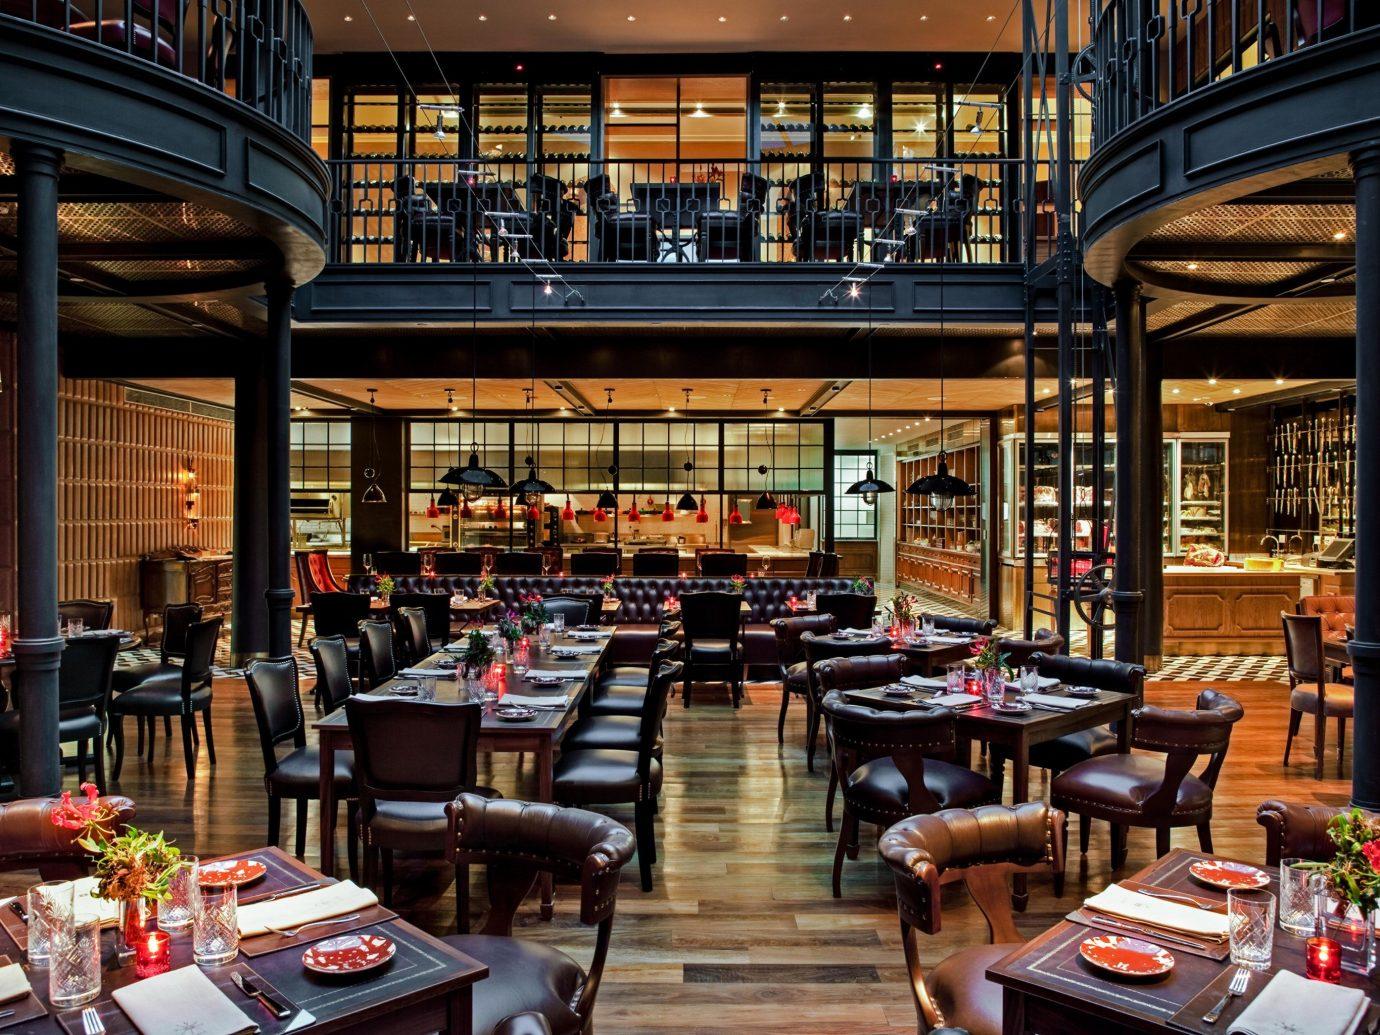 Boutique Hotels Luxury Travel building table restaurant interior design Lobby café coffeehouse tavern Bar several